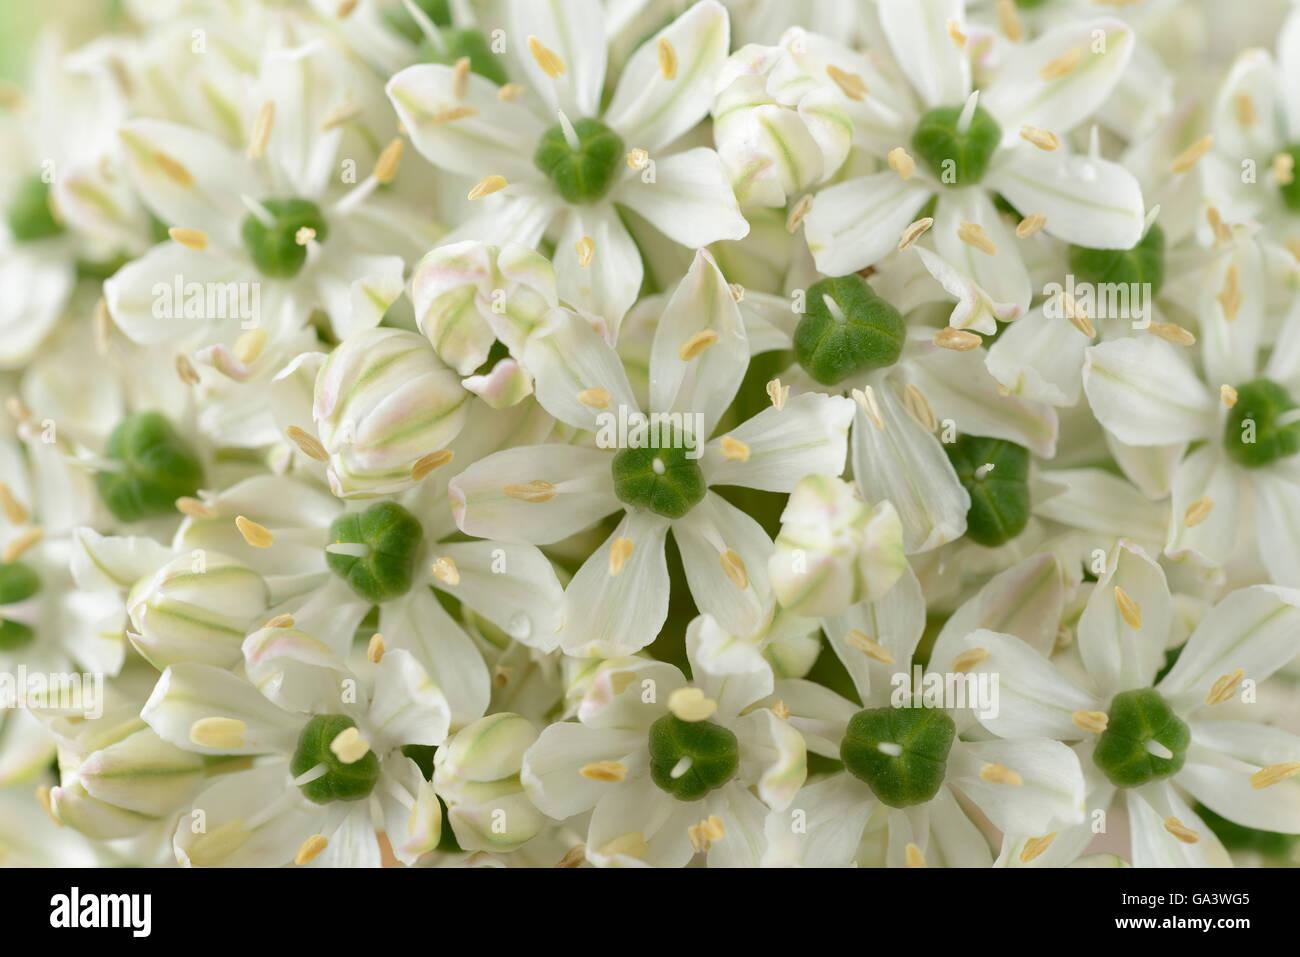 Garden summer june allium nigrum white bulb flower stock photos allium nigrum black garlic syn allium multibulbosum june stock image mightylinksfo